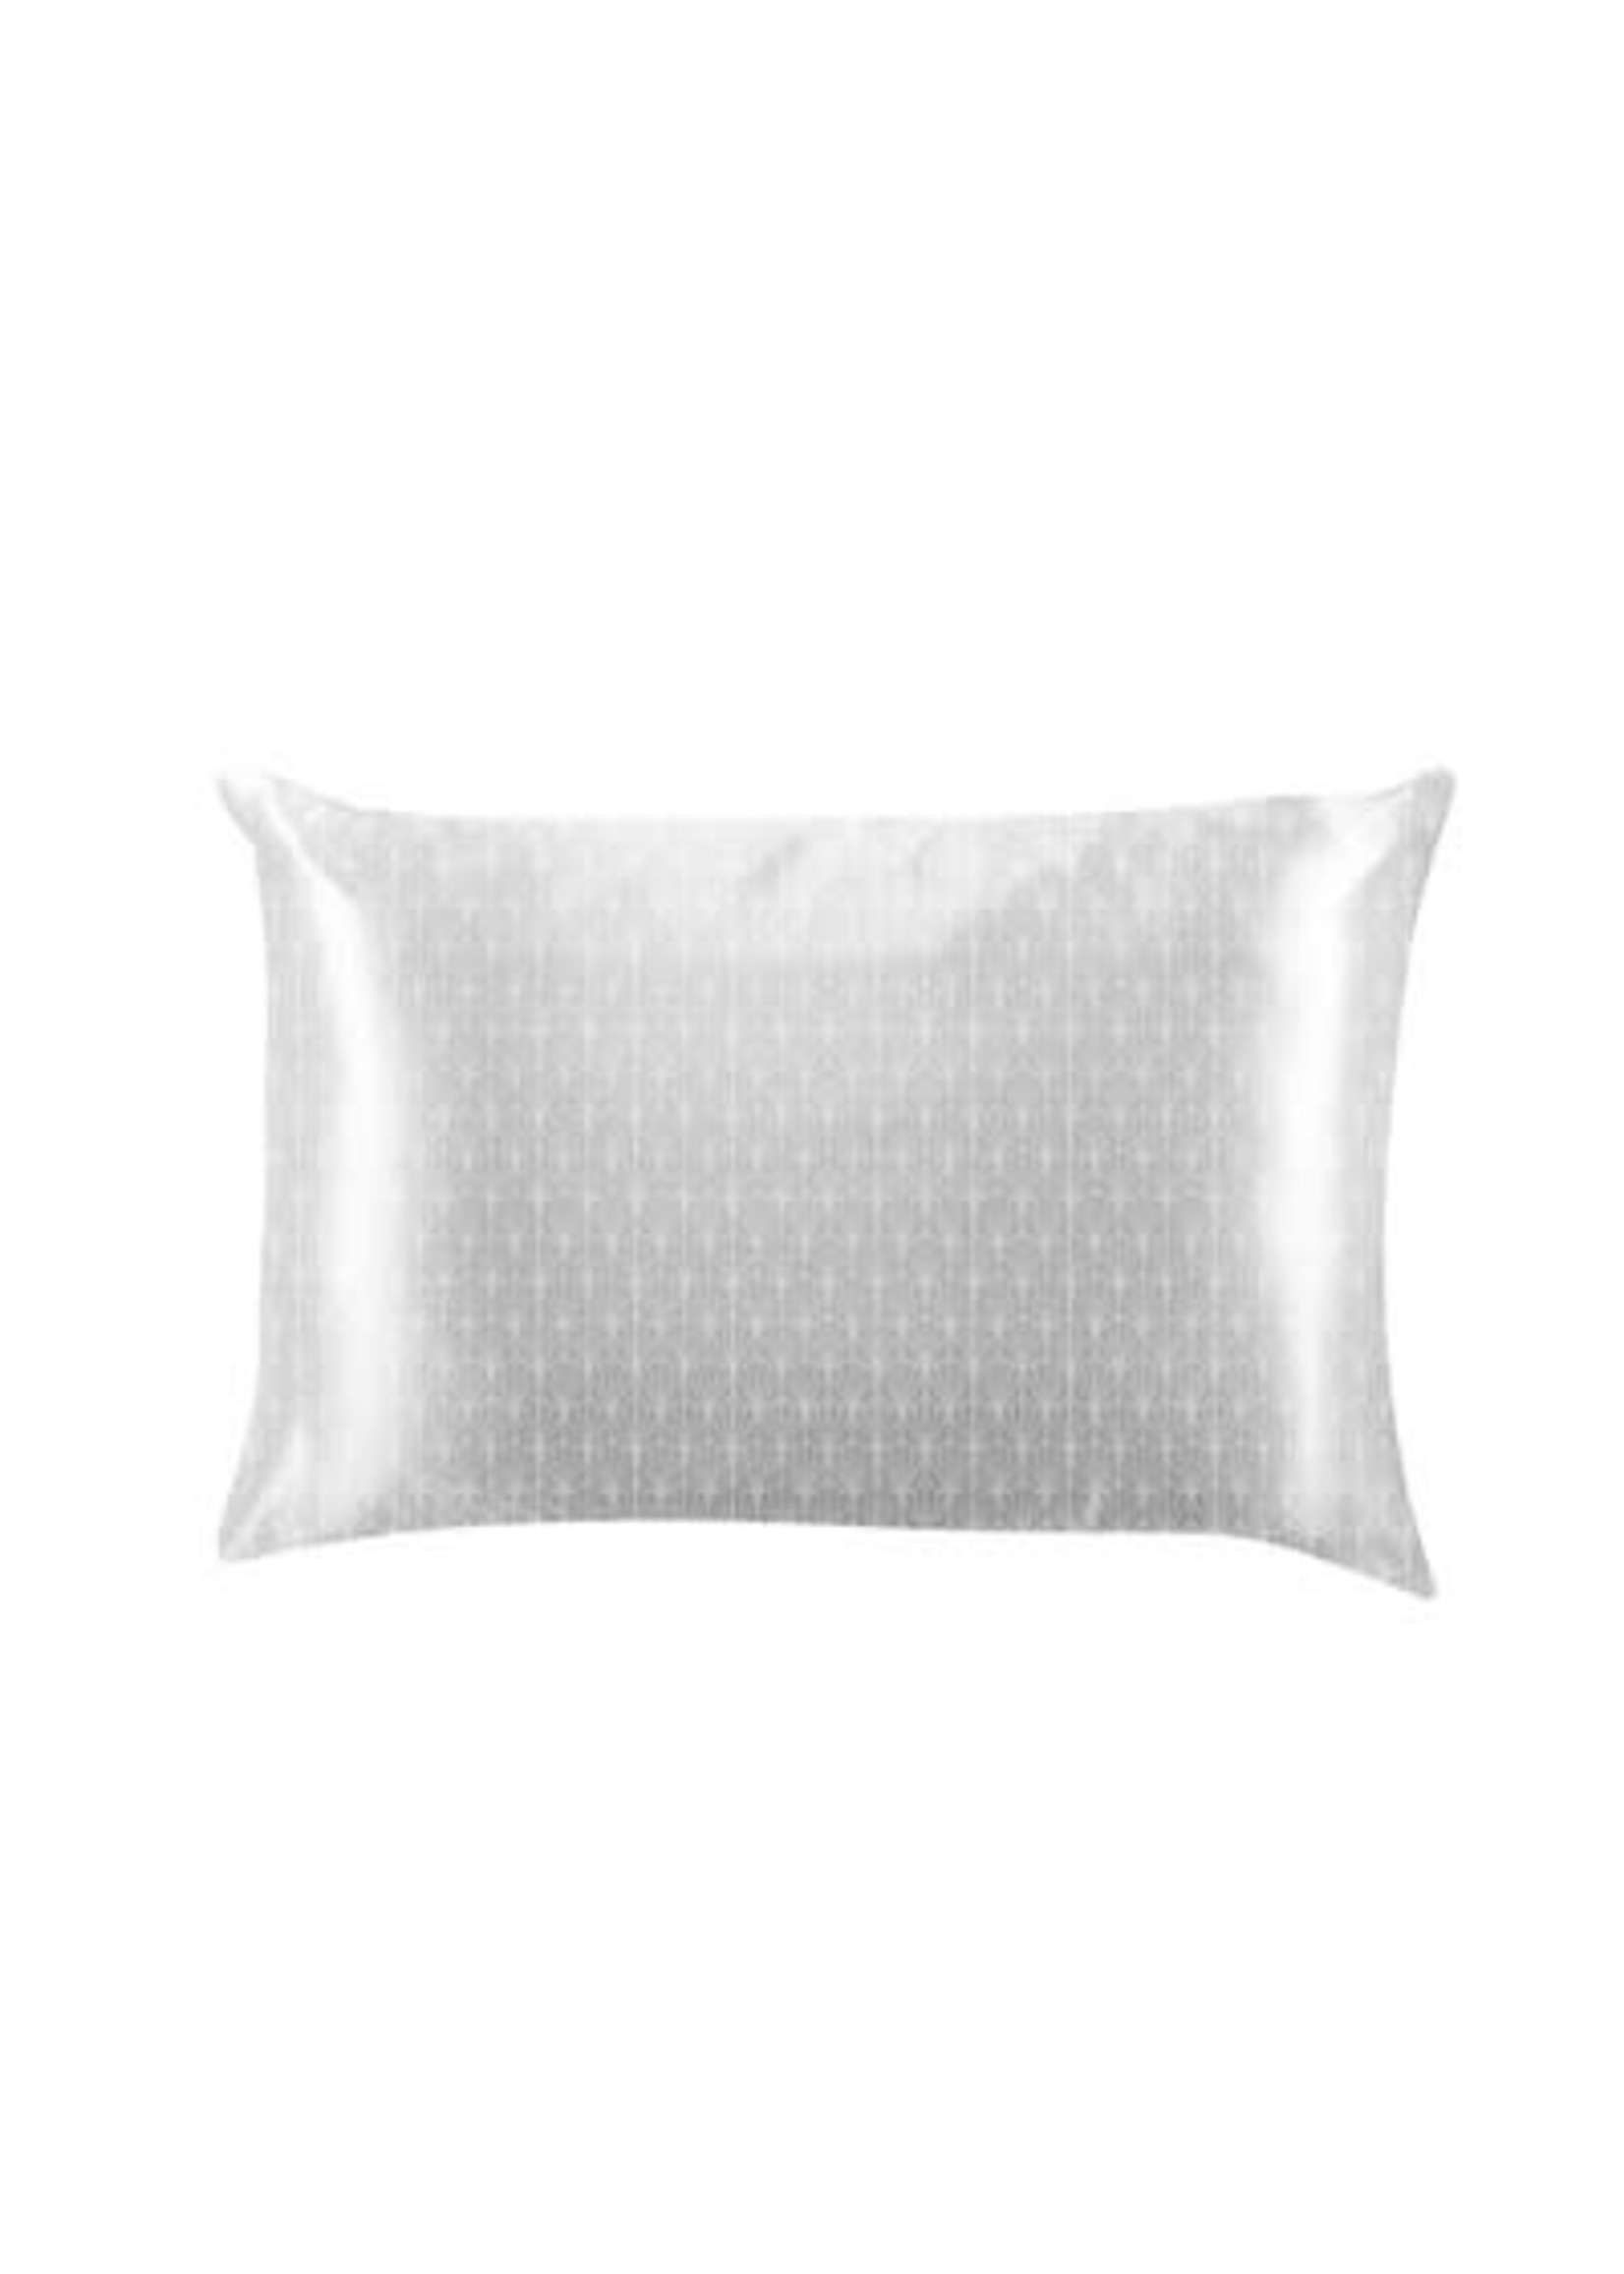 Lemon Lavender Silky Satin Pillowcase